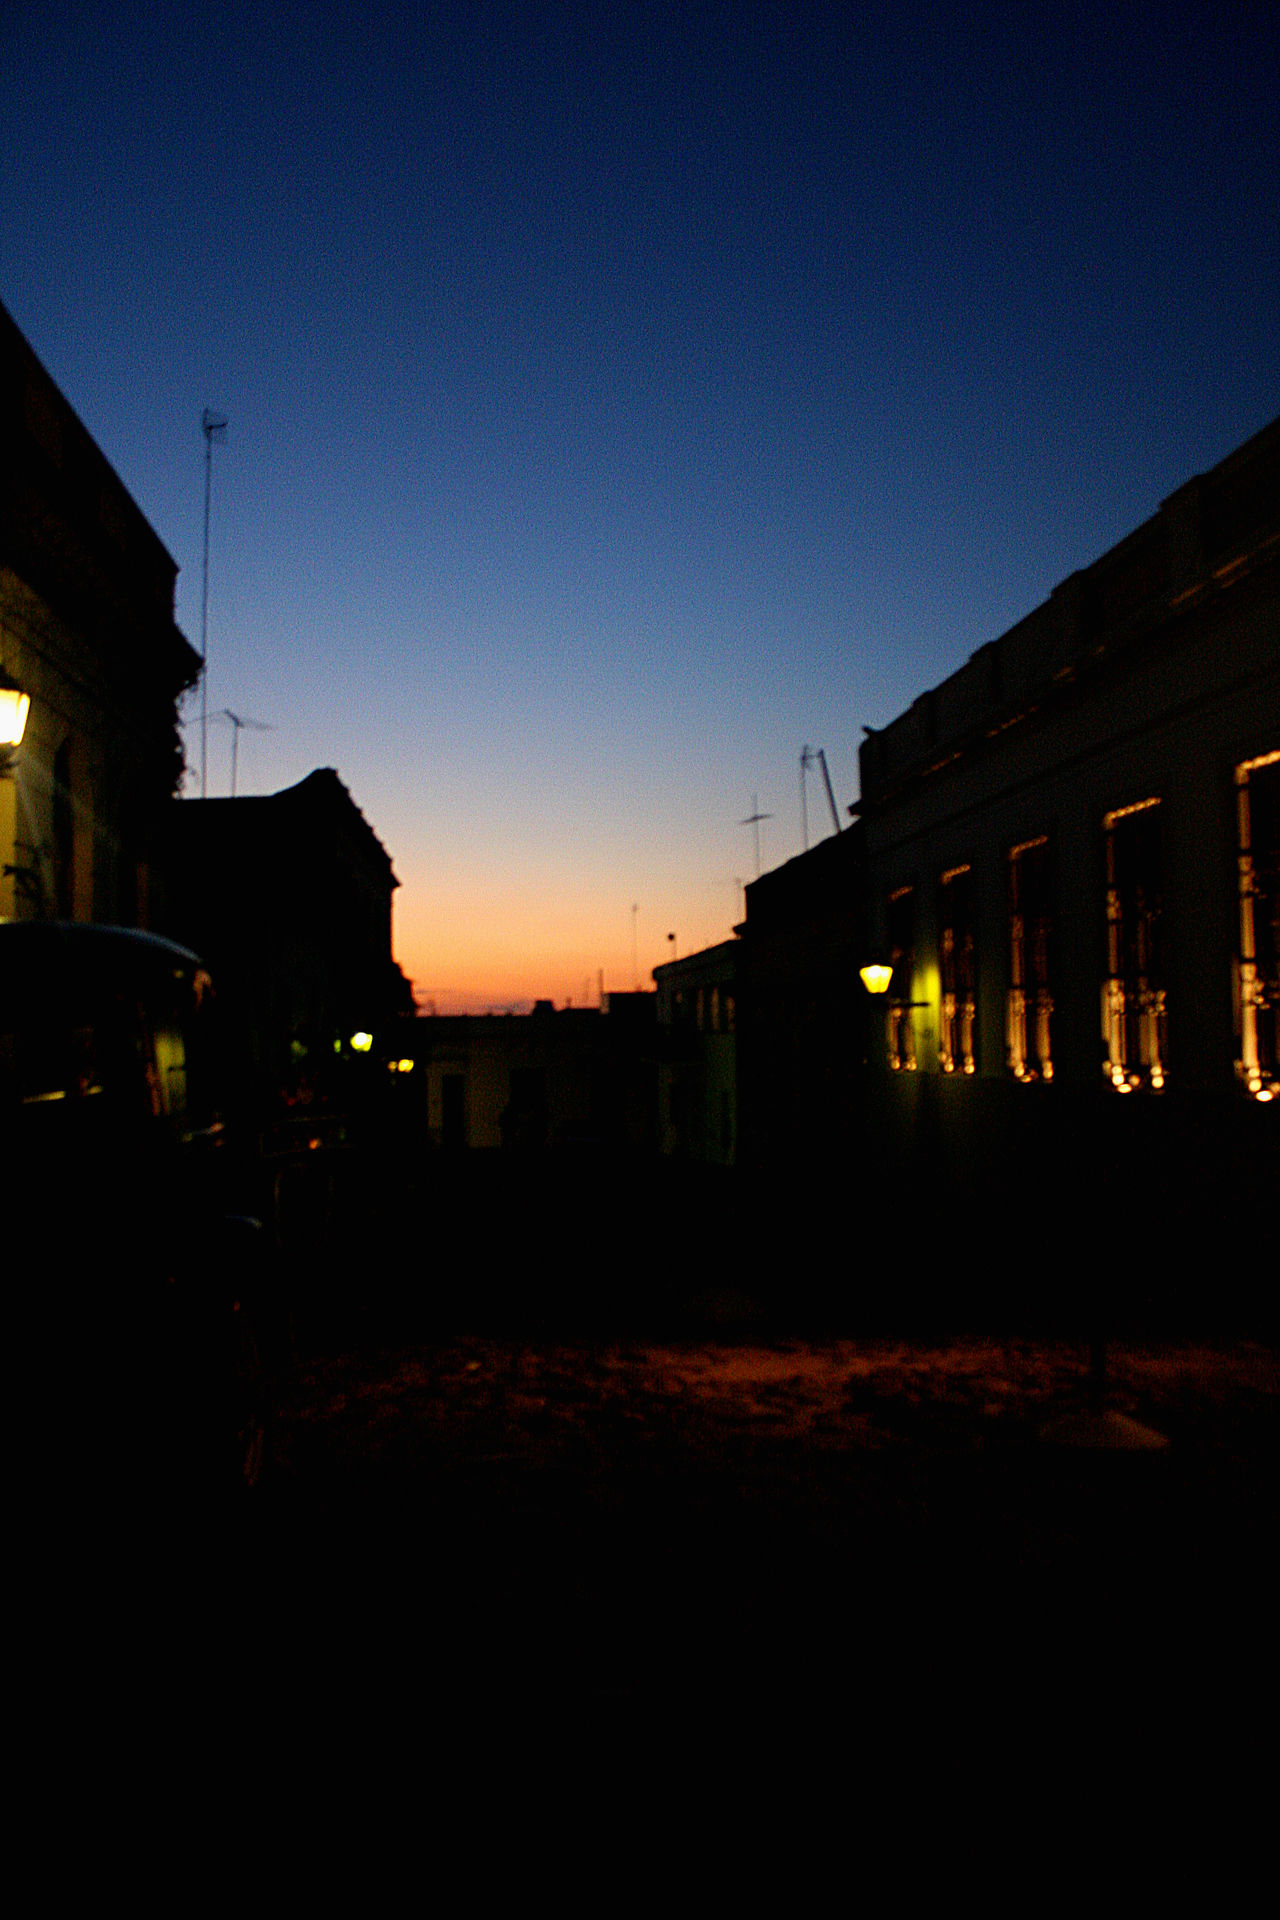 Sunset Coloniadelsacramento Uruguay First Eyeem Photo Fine Art Photograhy Melancolic Decorative Art